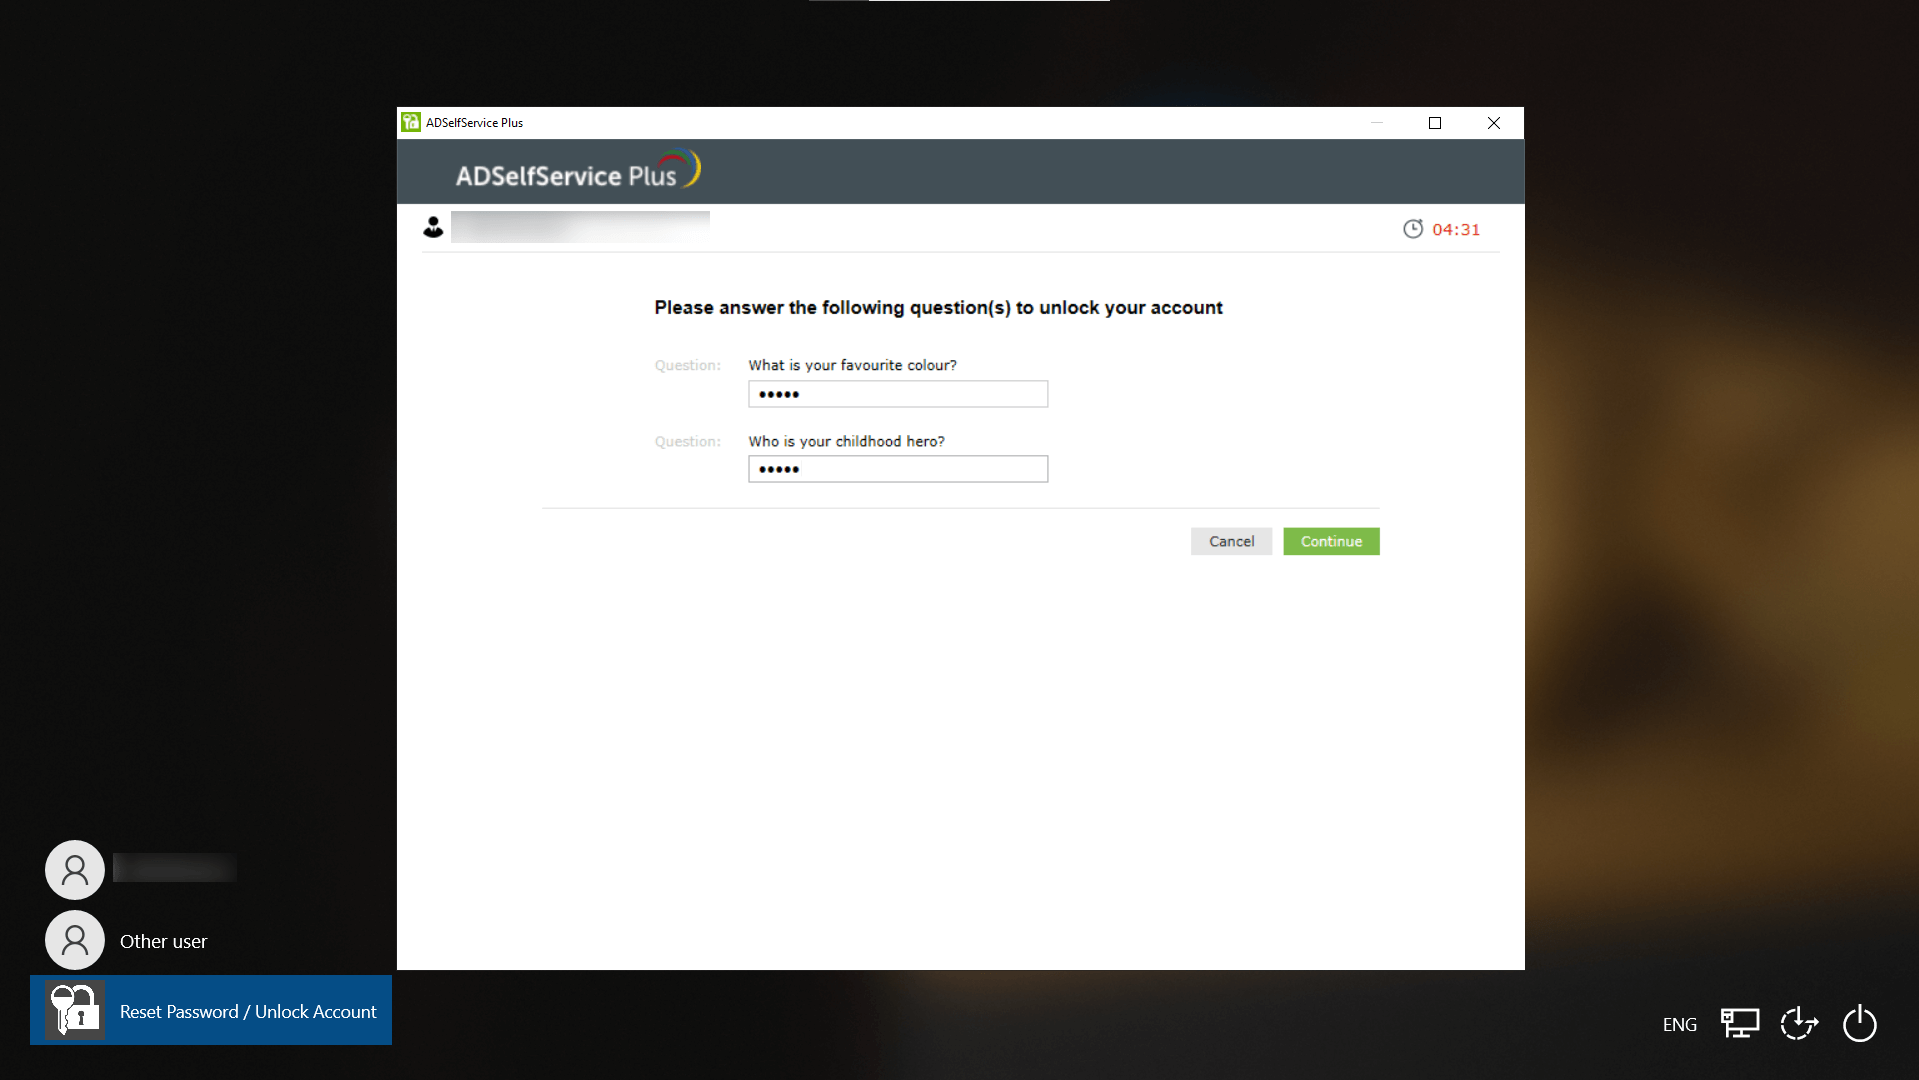 Reset an administrator password using ADSelfService Plus